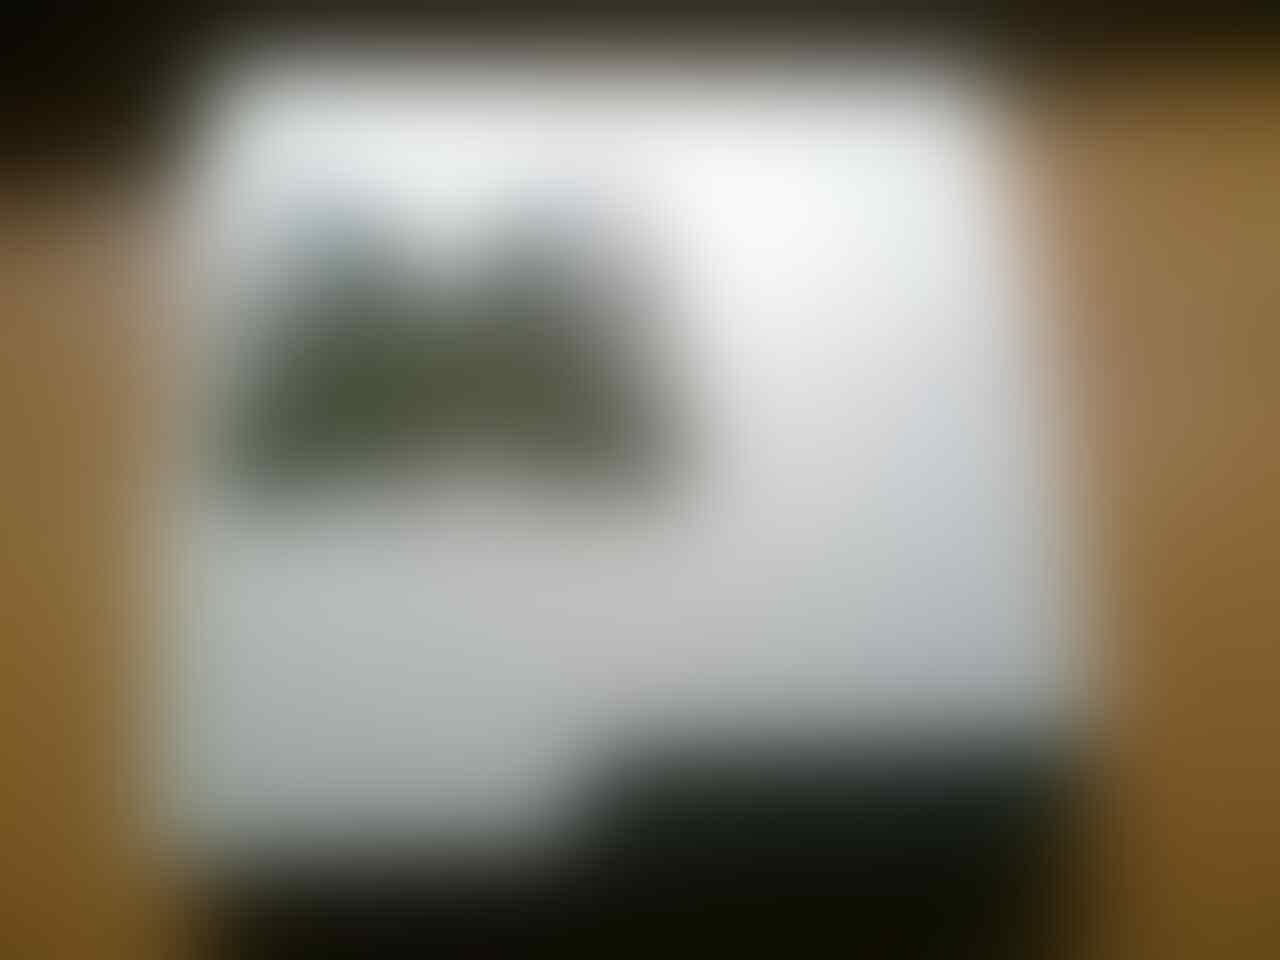 ps3 slim 160gb putih ori cfw 3.55